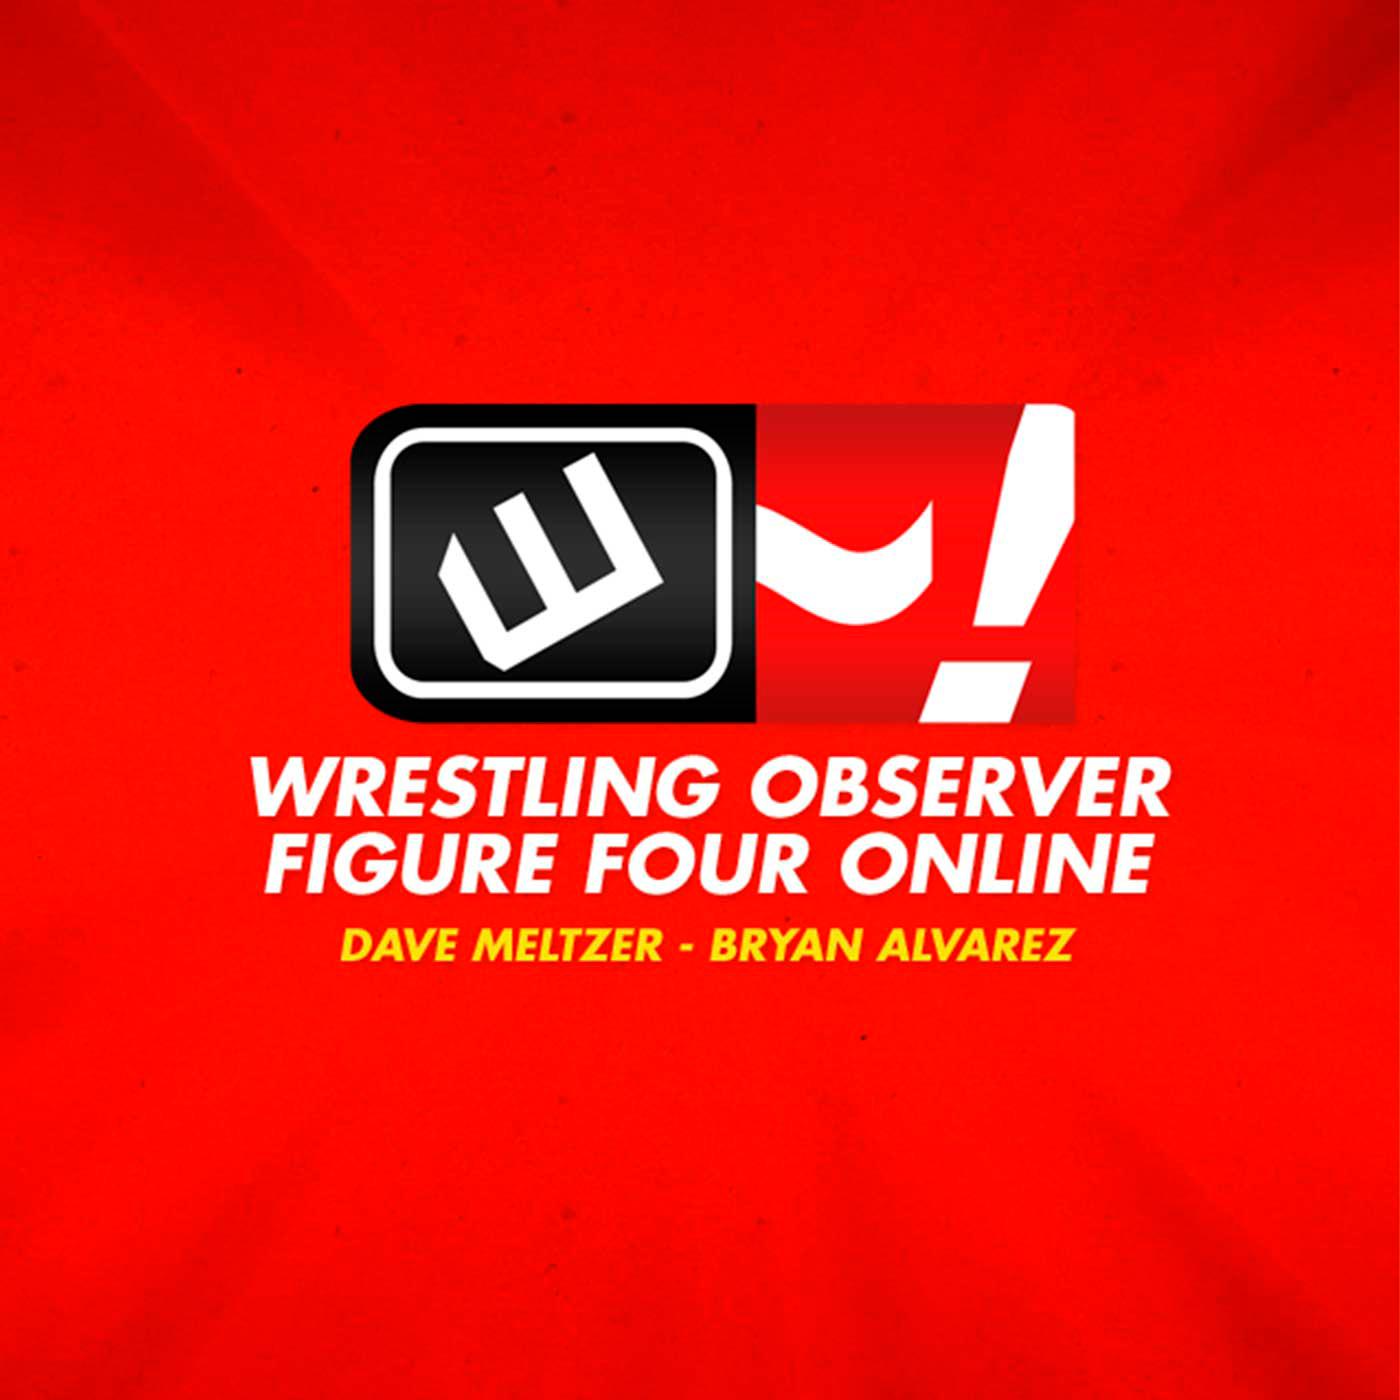 Wrestling Observer Figure Four Online | Listen via Stitcher for ...